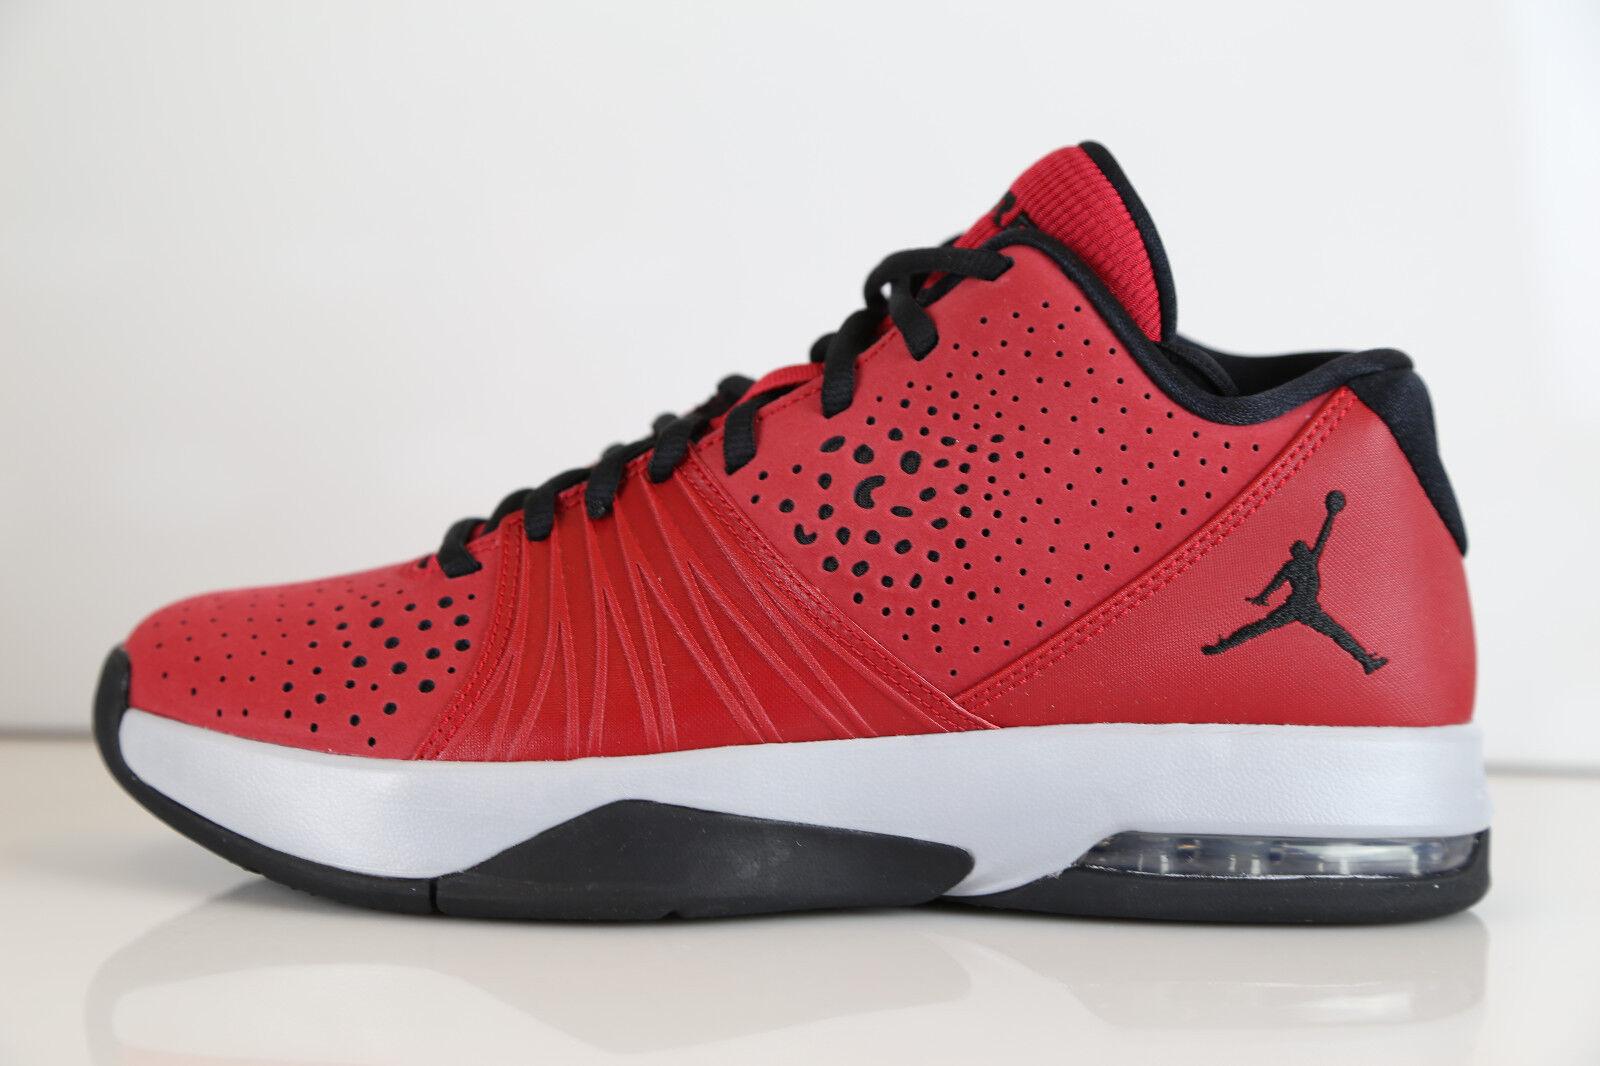 Nike air jordan 5 palestra rosso - nero grigio 807546-603 7 - 14 11 16 5 supremo 1 3